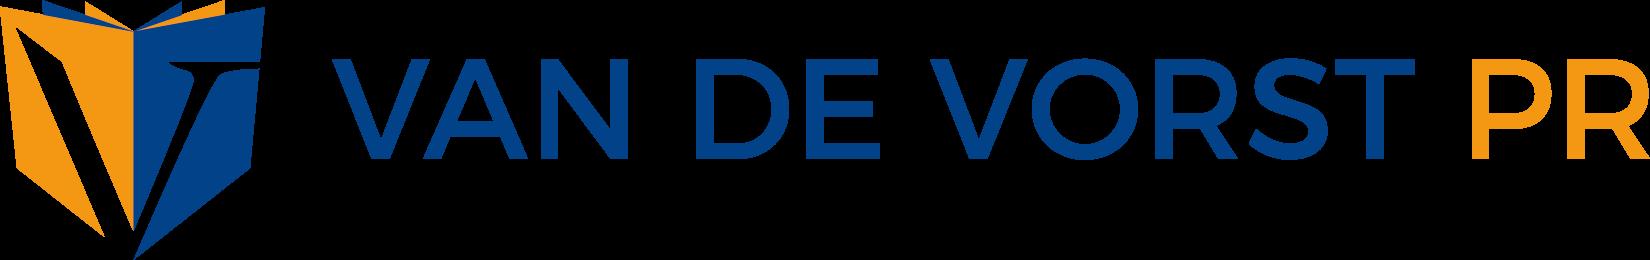 Logo Van de Vorst PR webcase